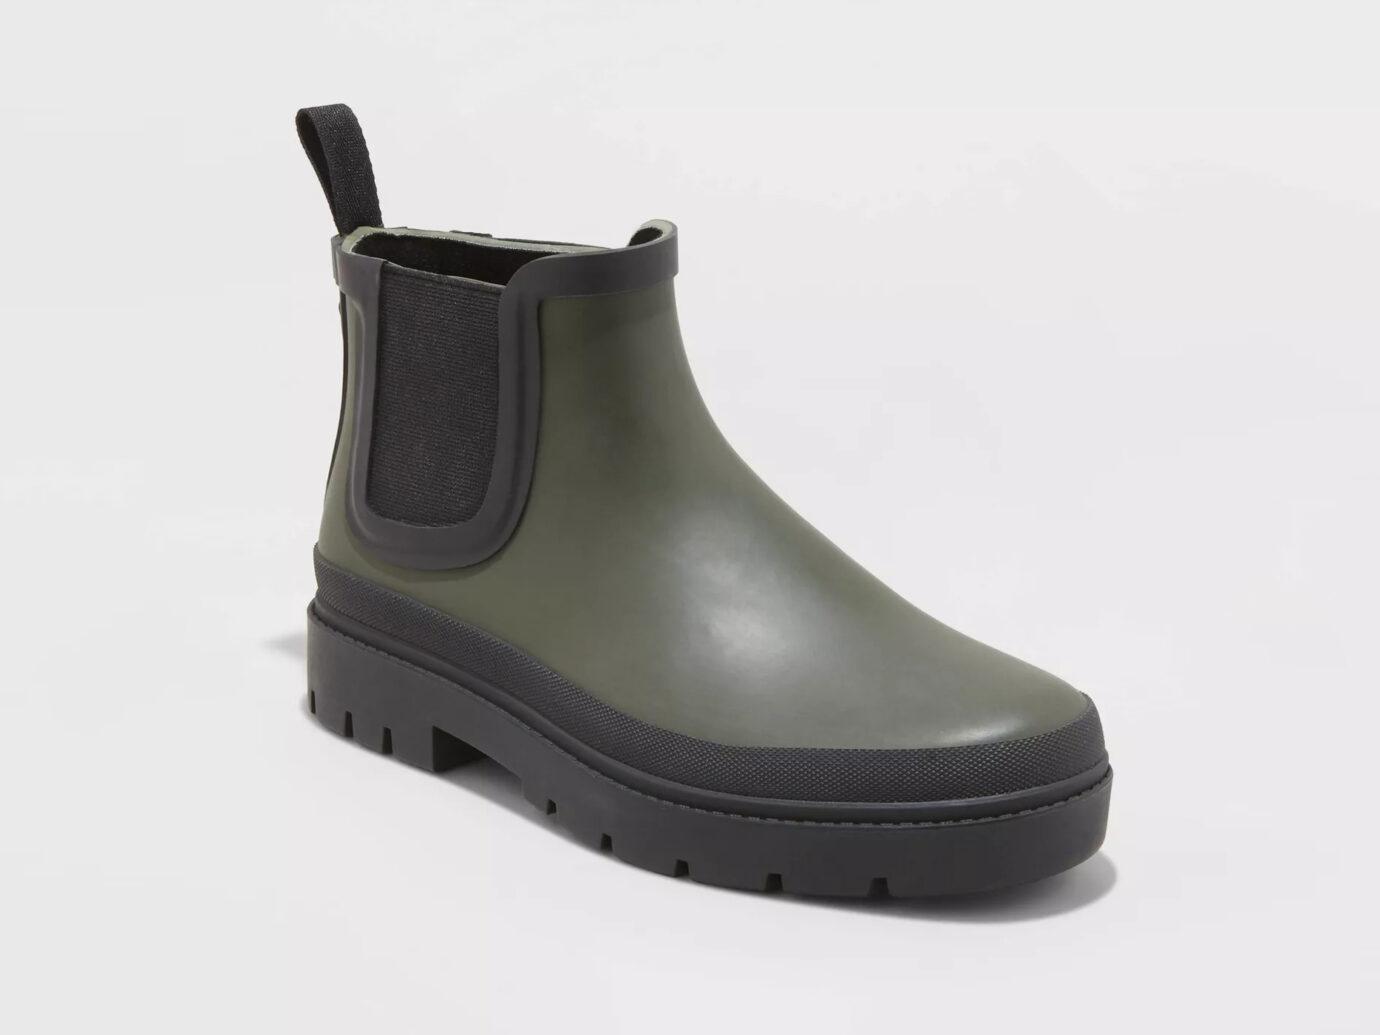 11 BEST Rain Boots for Women 2020: Cute